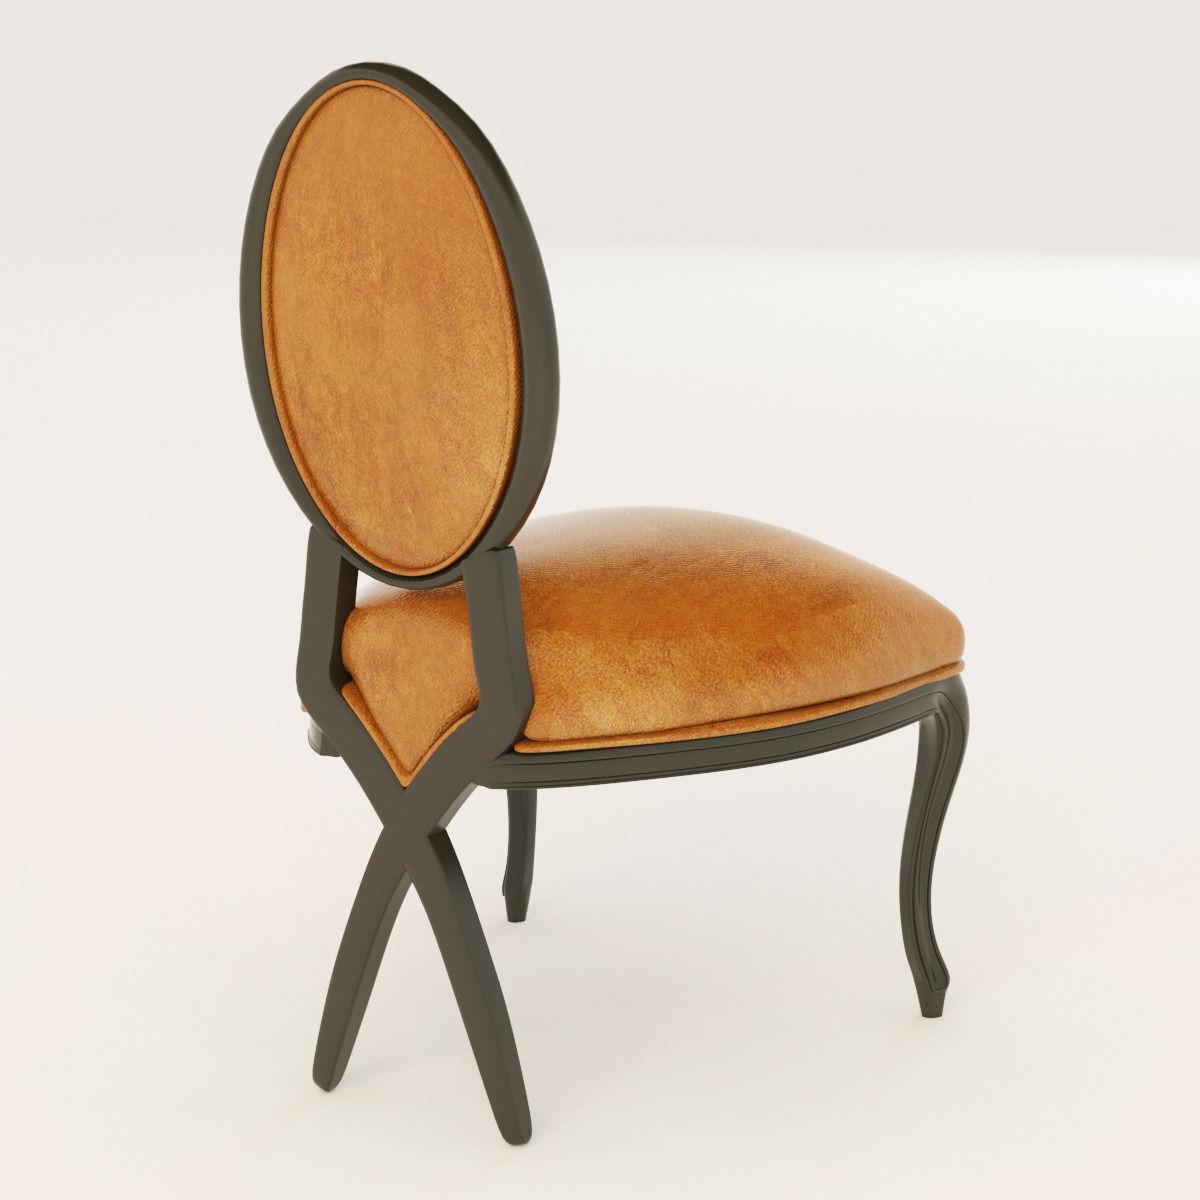 Christopher Guy Furniture Christopher Guy Chair St0044 3d Model Max Obj 3ds Fbx Mtl